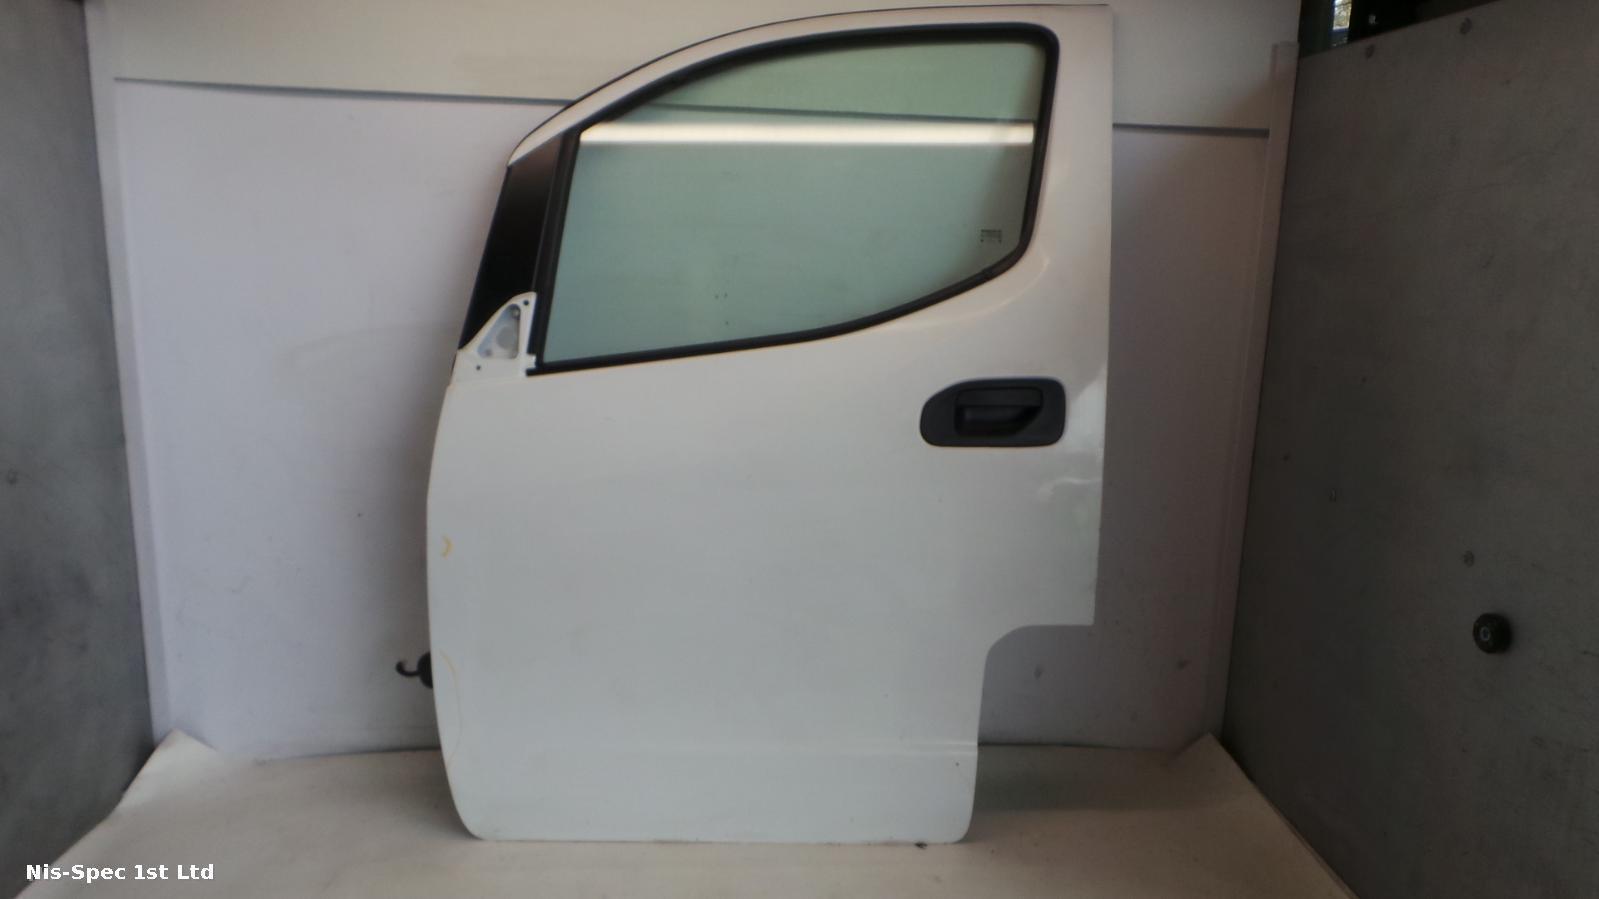 NV200 PASSENGER LEFT NEARSIDE FRONT DOOR SMALL DENT SEE PICS